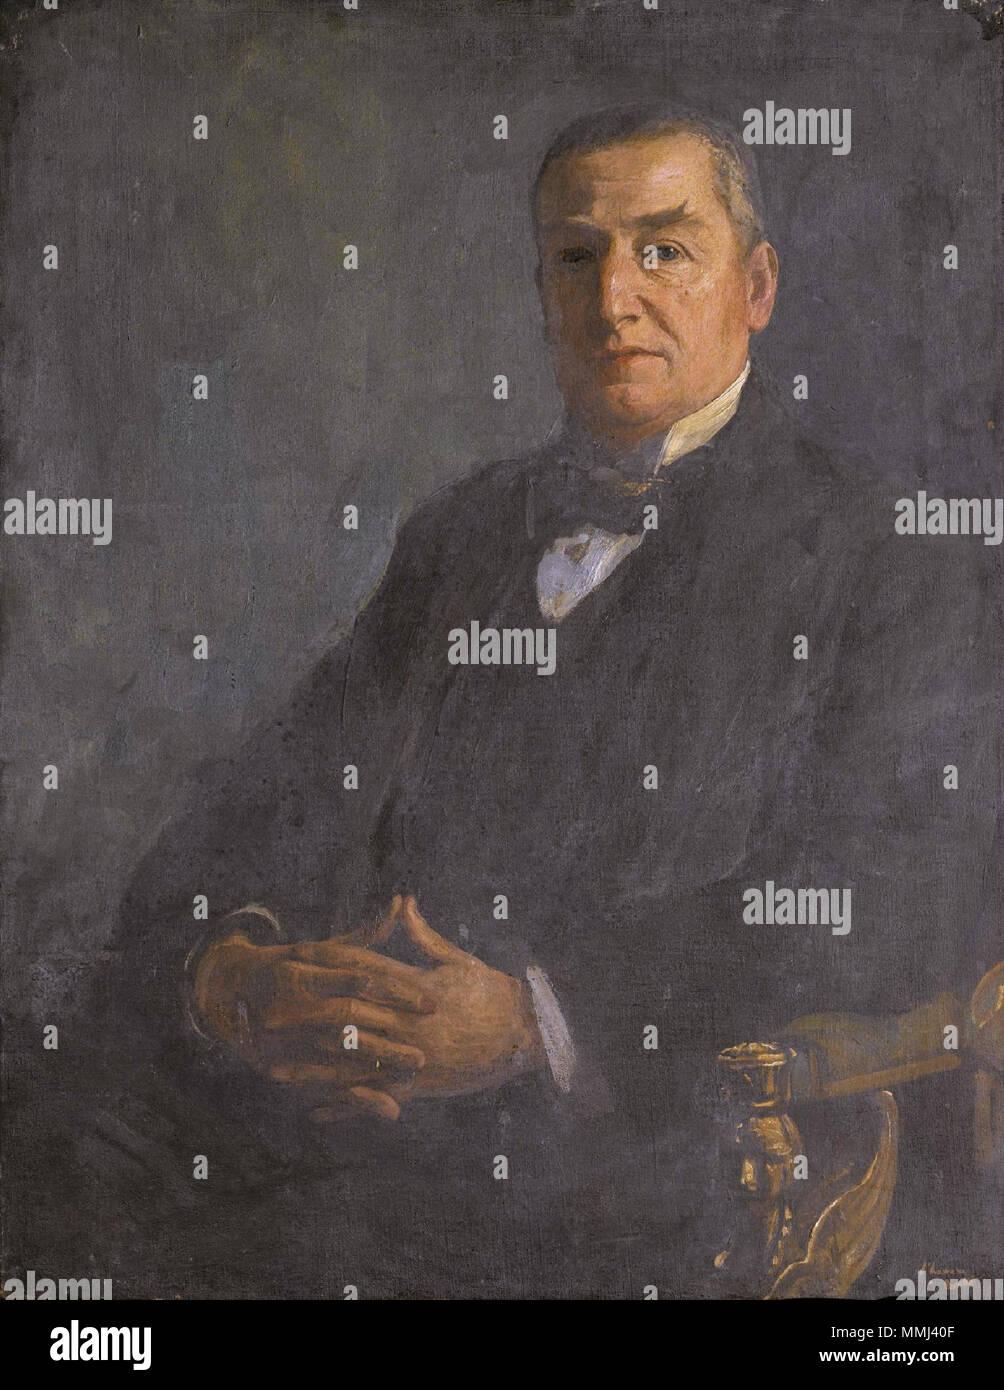 1881 1939 Stock Photos & 1881 1939 Stock Images - Alamy